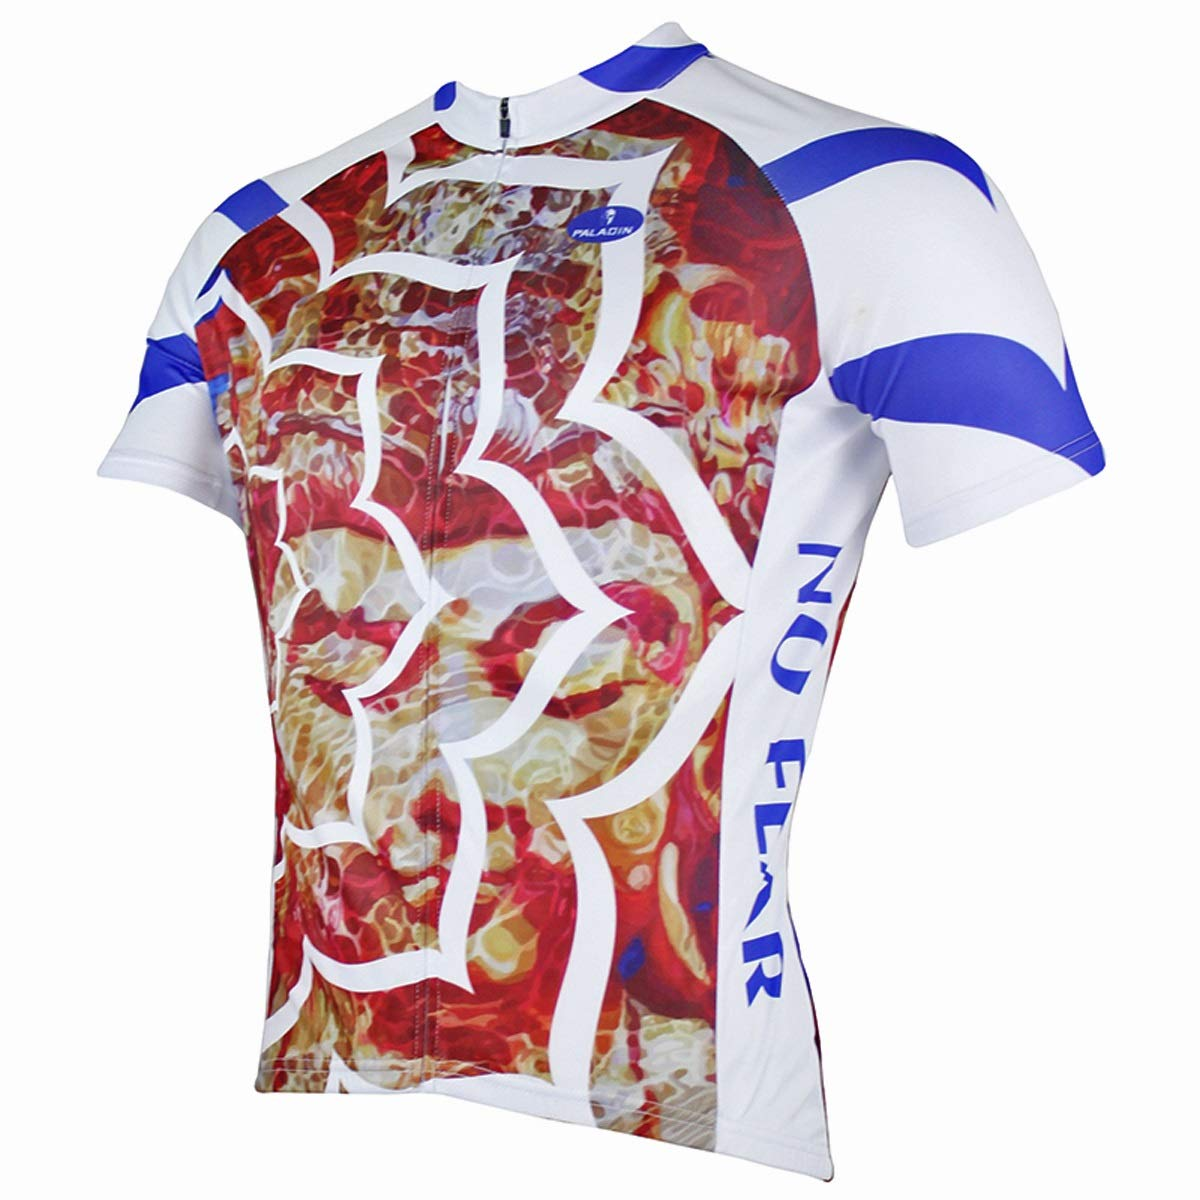 Fahrrad Reitanzug Rot Radsportanzug Sport Essential Kurzarm Tops Leichtes Quick Dry Bike Trikot Fahrradtrikot LPLHJD